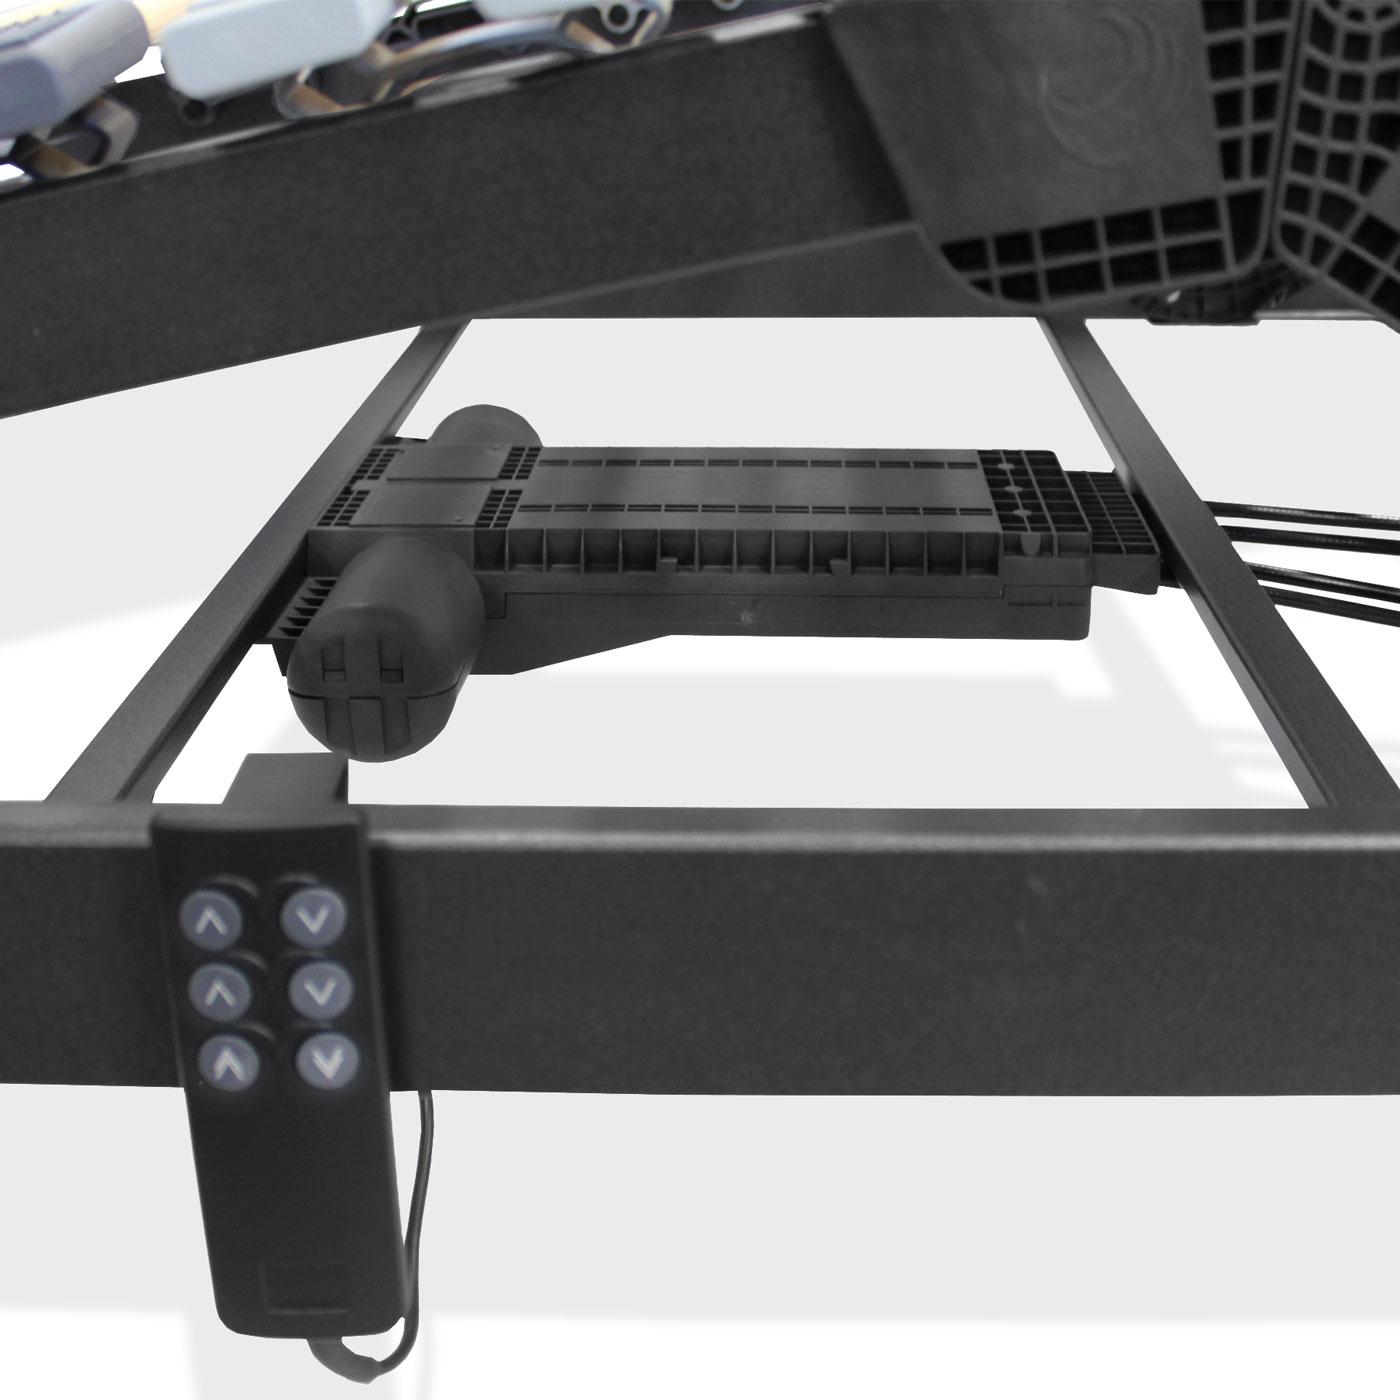 elektrischer lattenrost orthowell ultraflex xxl motor. Black Bedroom Furniture Sets. Home Design Ideas